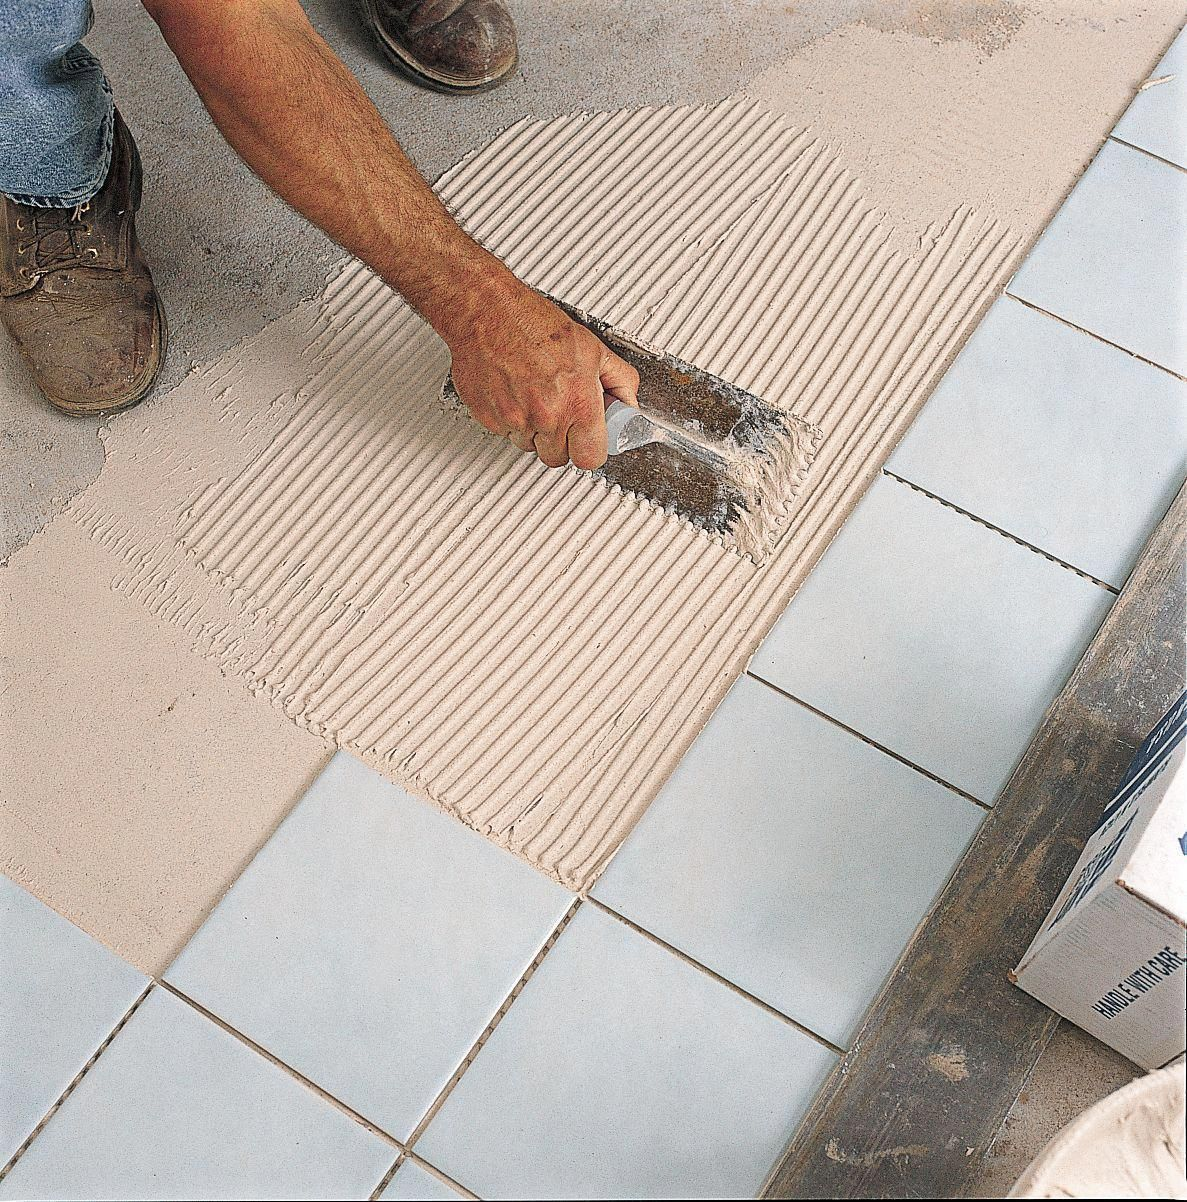 The Simple Secrets To Installing A Ceramic Tile Floor Homeimprovement Ceramic Floor Tiles Installing Tile Floor Tile Floor Diy